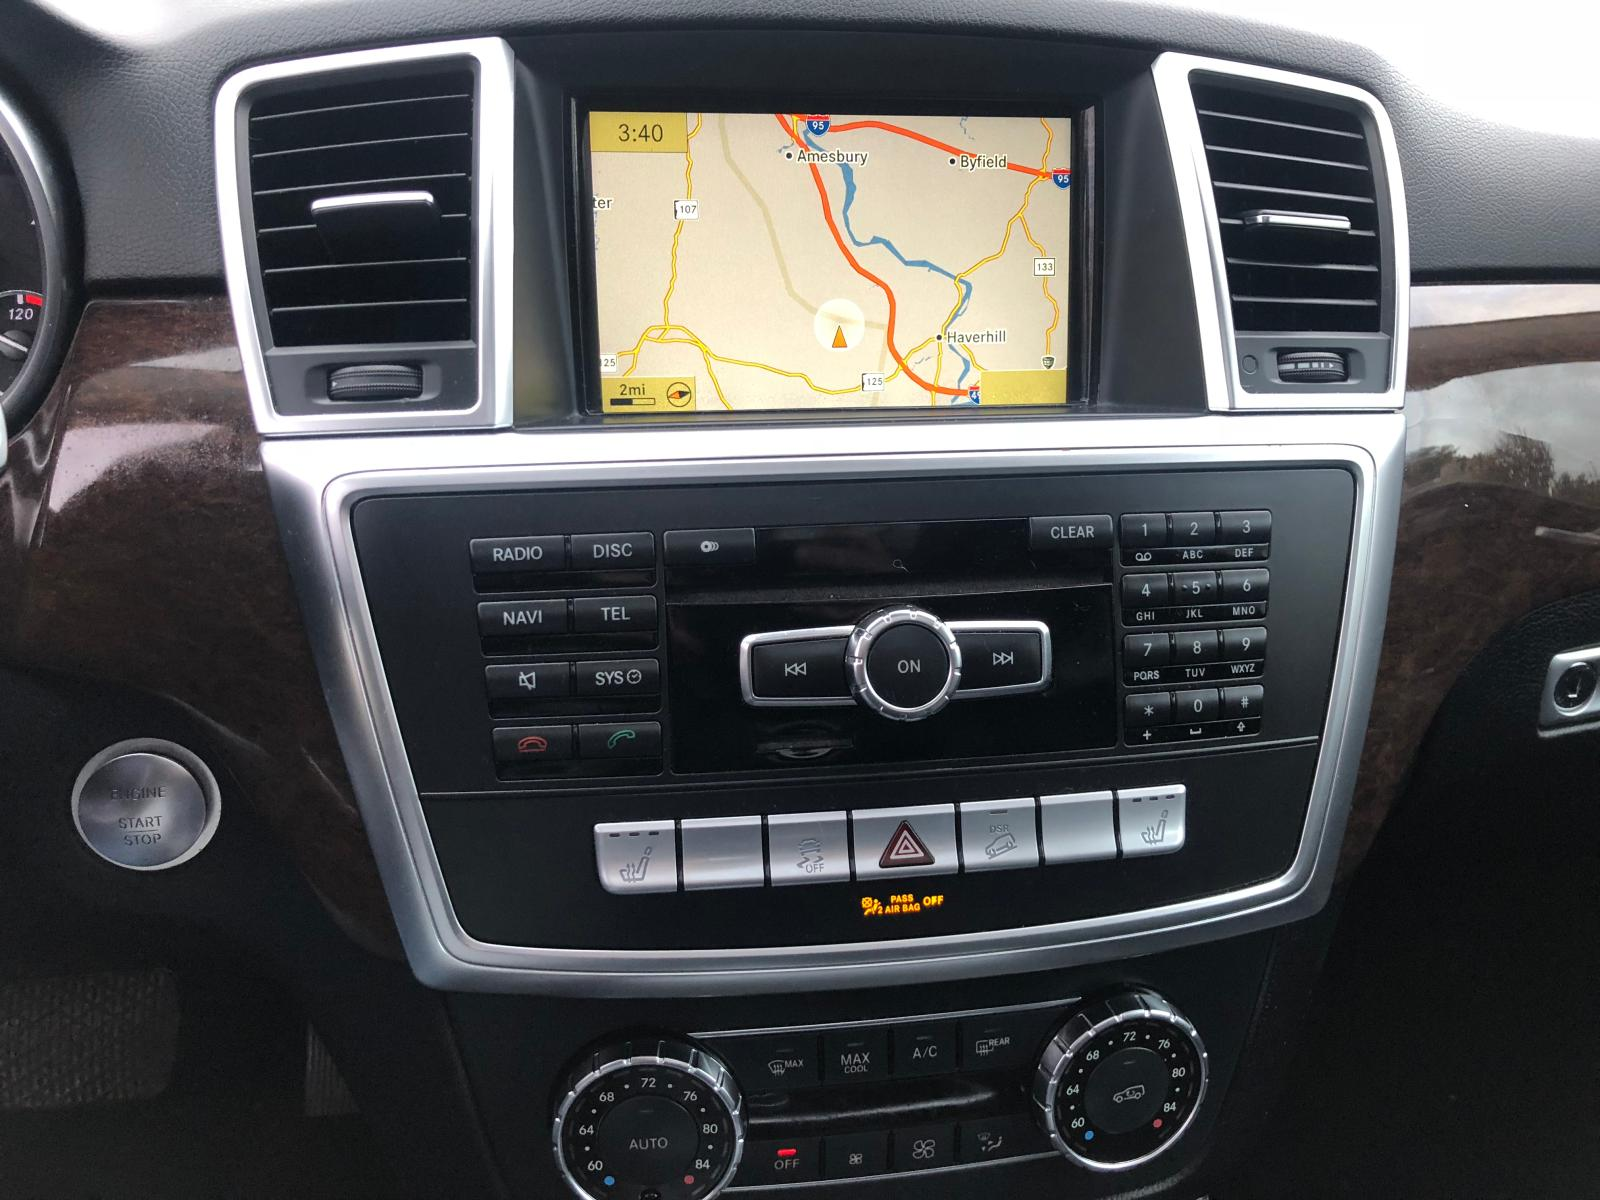 2012 Mercedes-Benz Ml 350 4Ma 3.5L engine view